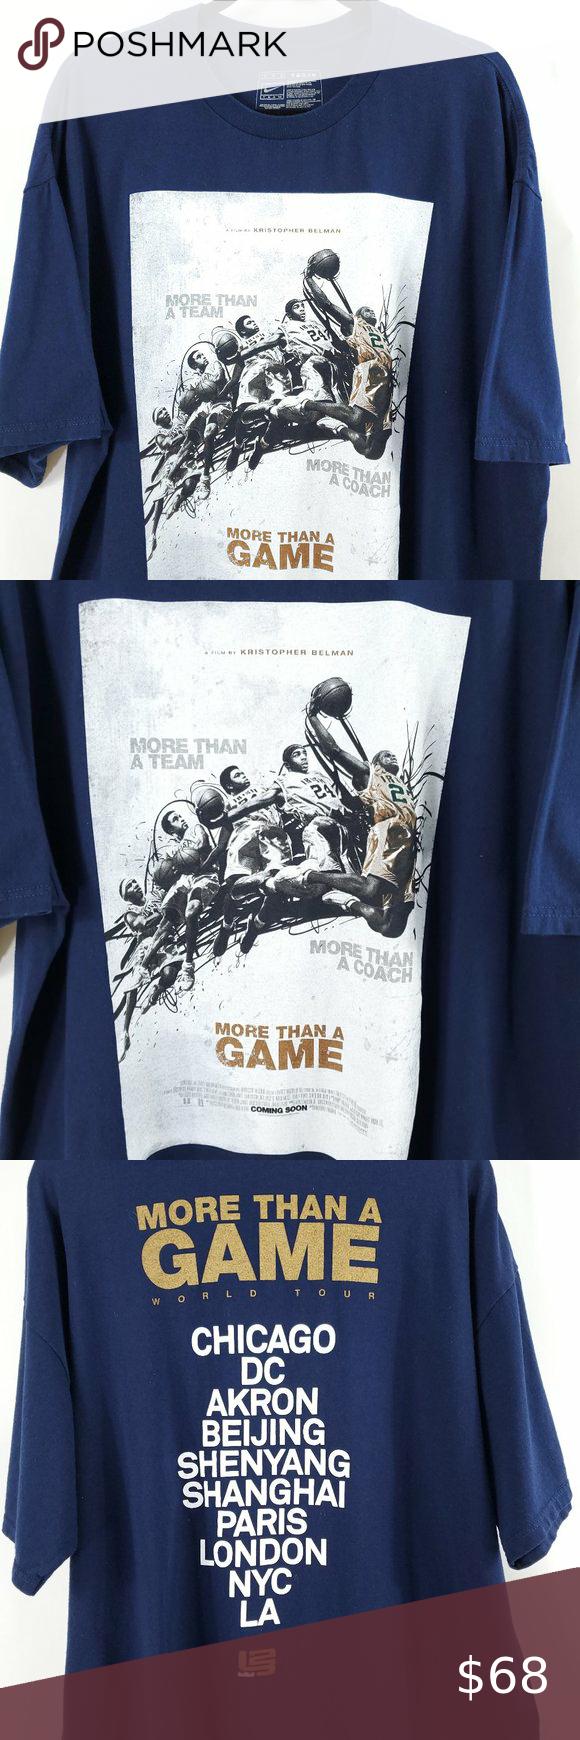 Lebron James Shirt Nike More Than A Game Lebron James Shirts Shirts Lebron James [ 1740 x 580 Pixel ]